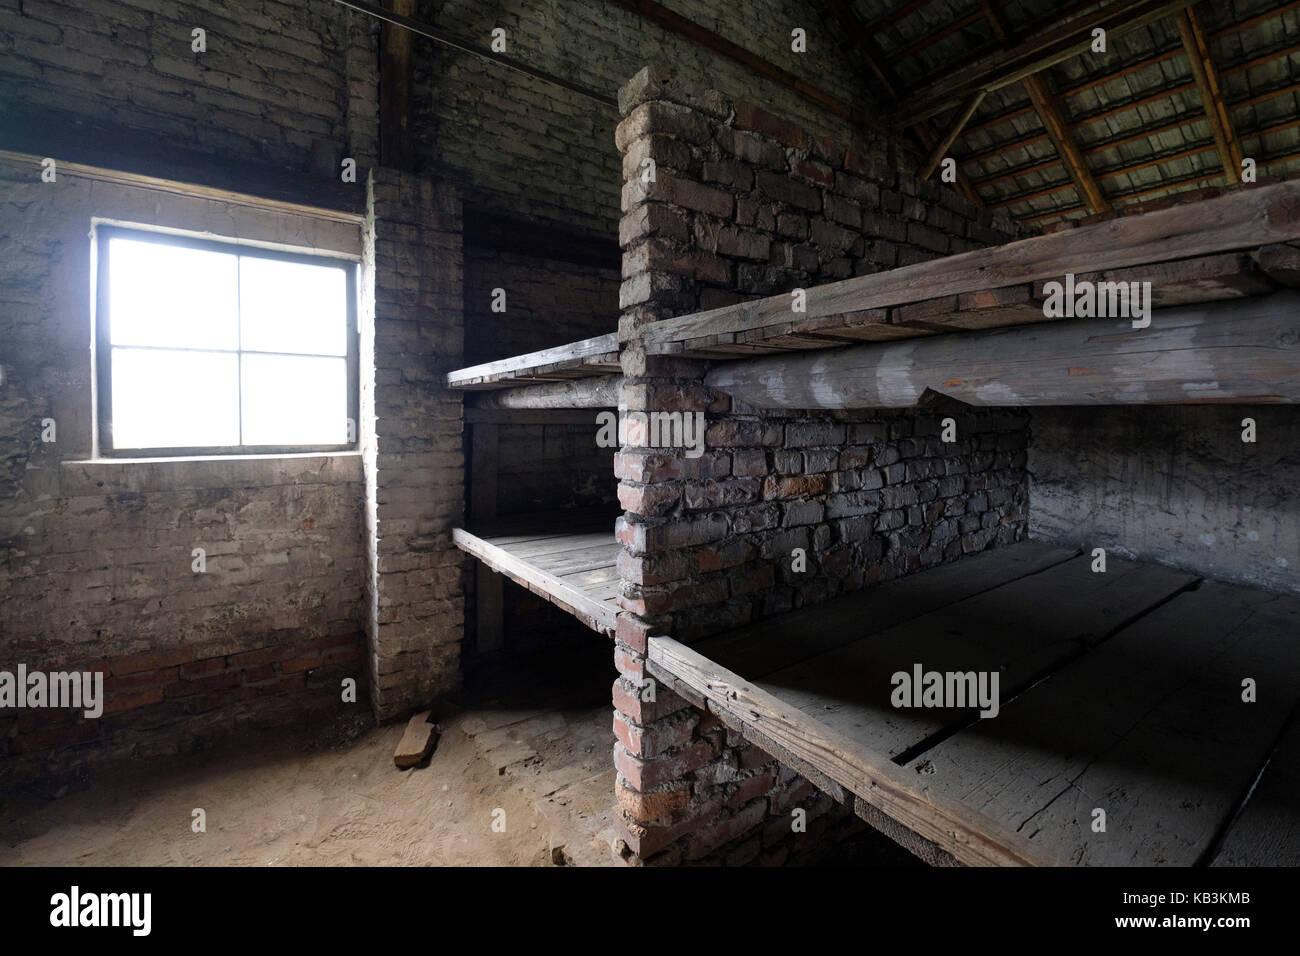 Prisoners barracks at Auschwitz II Birkenau WWII Nazi concentration camp, Poland - Stock Image